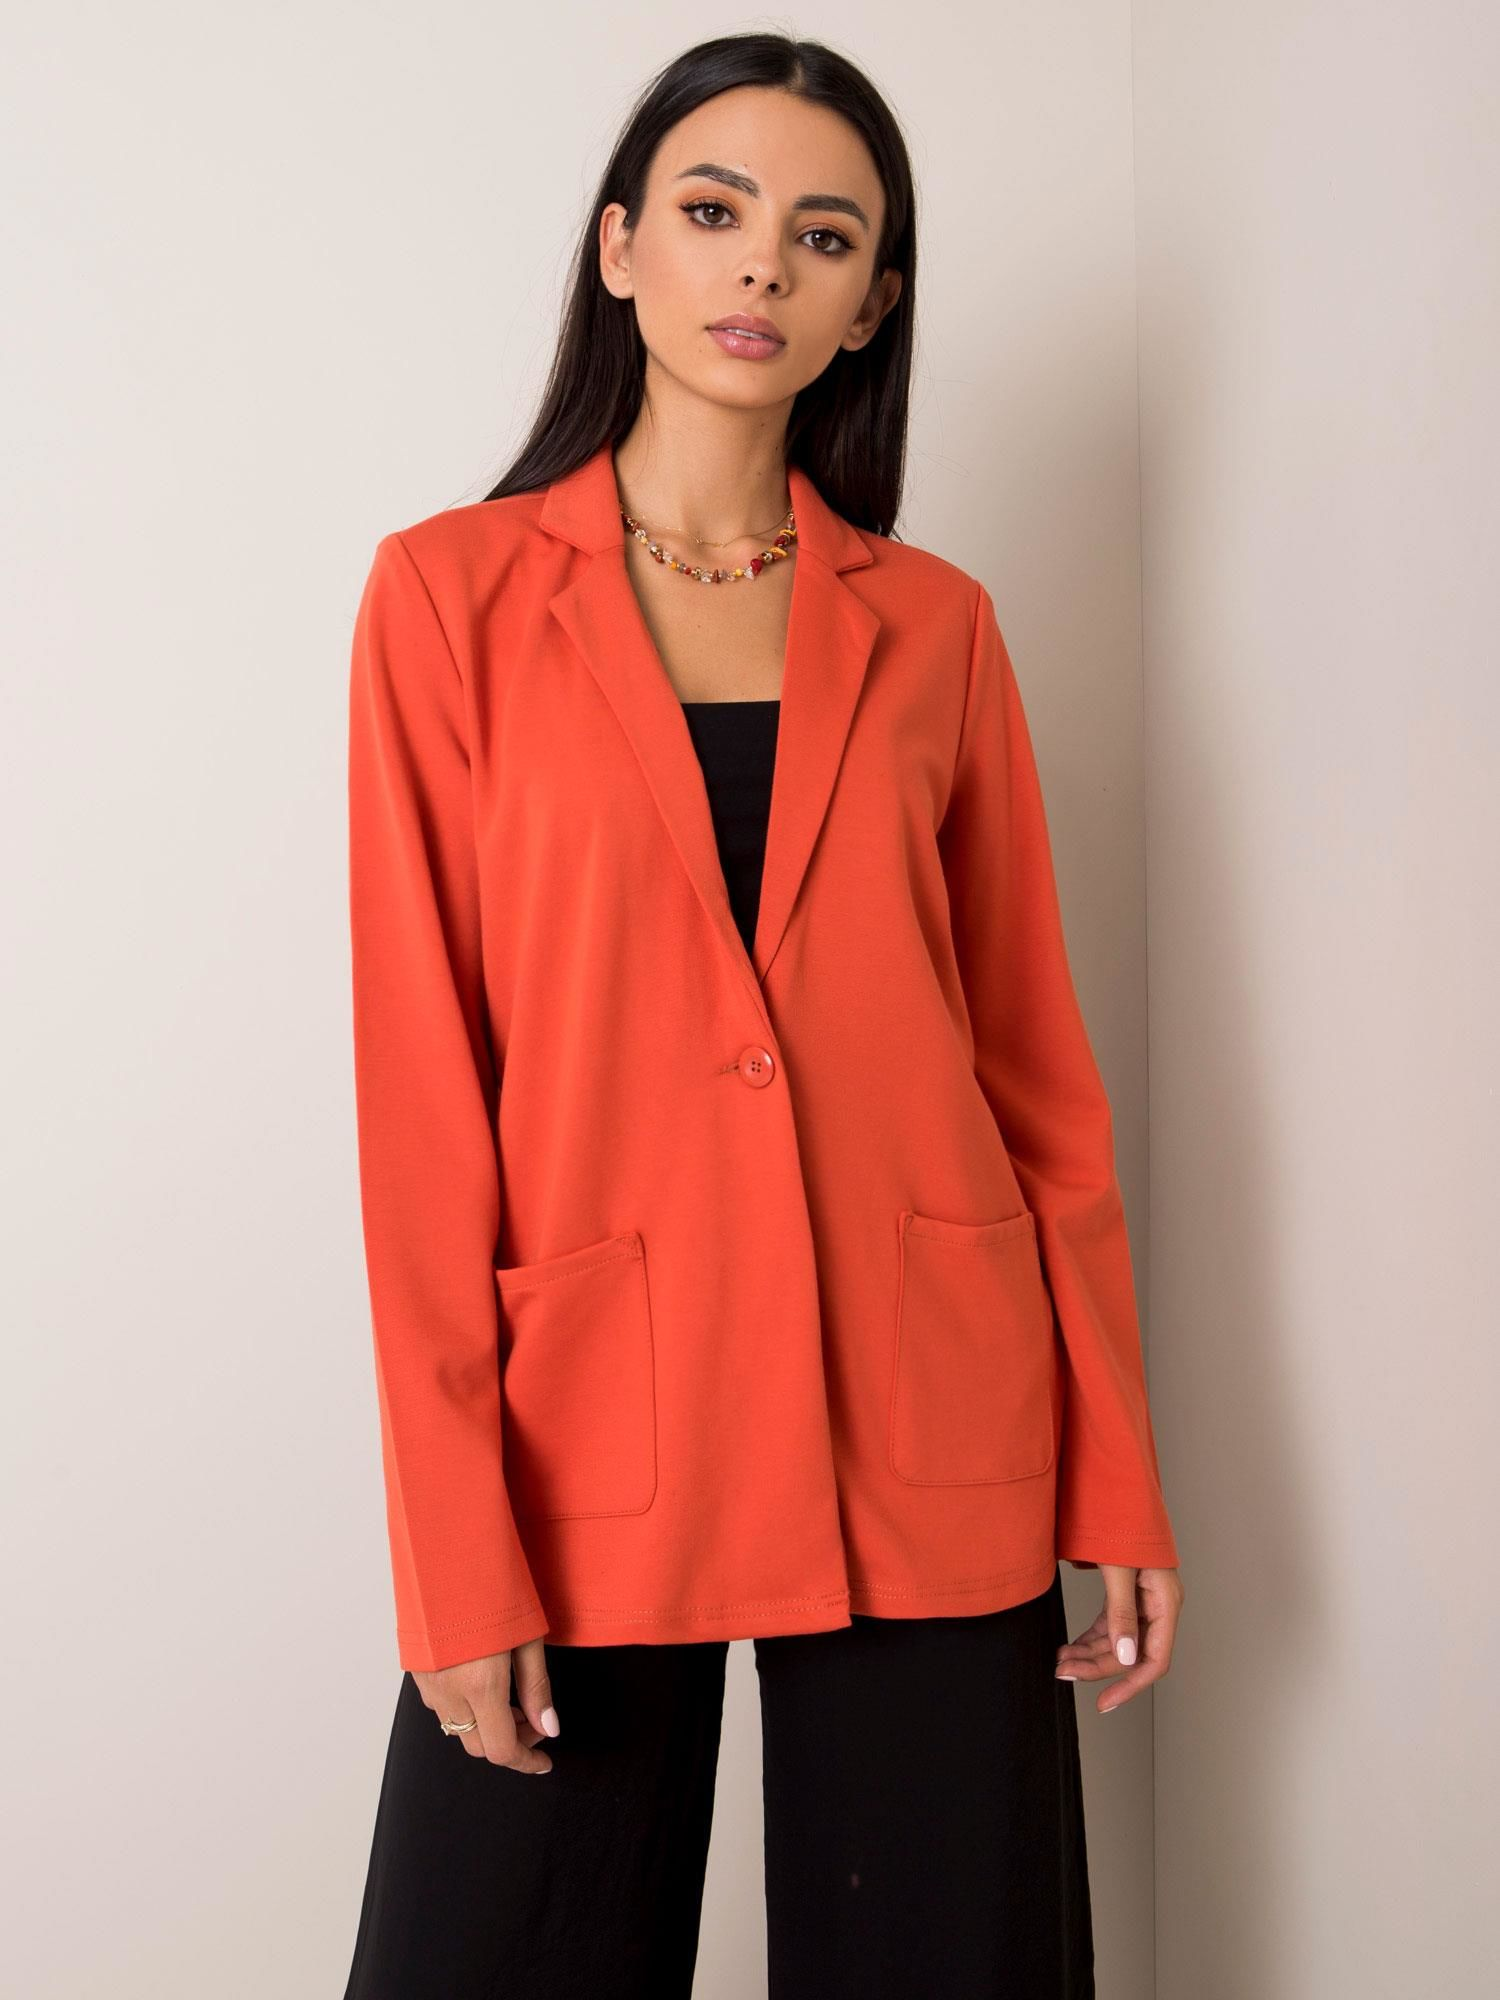 Dámske oranžové sako - S